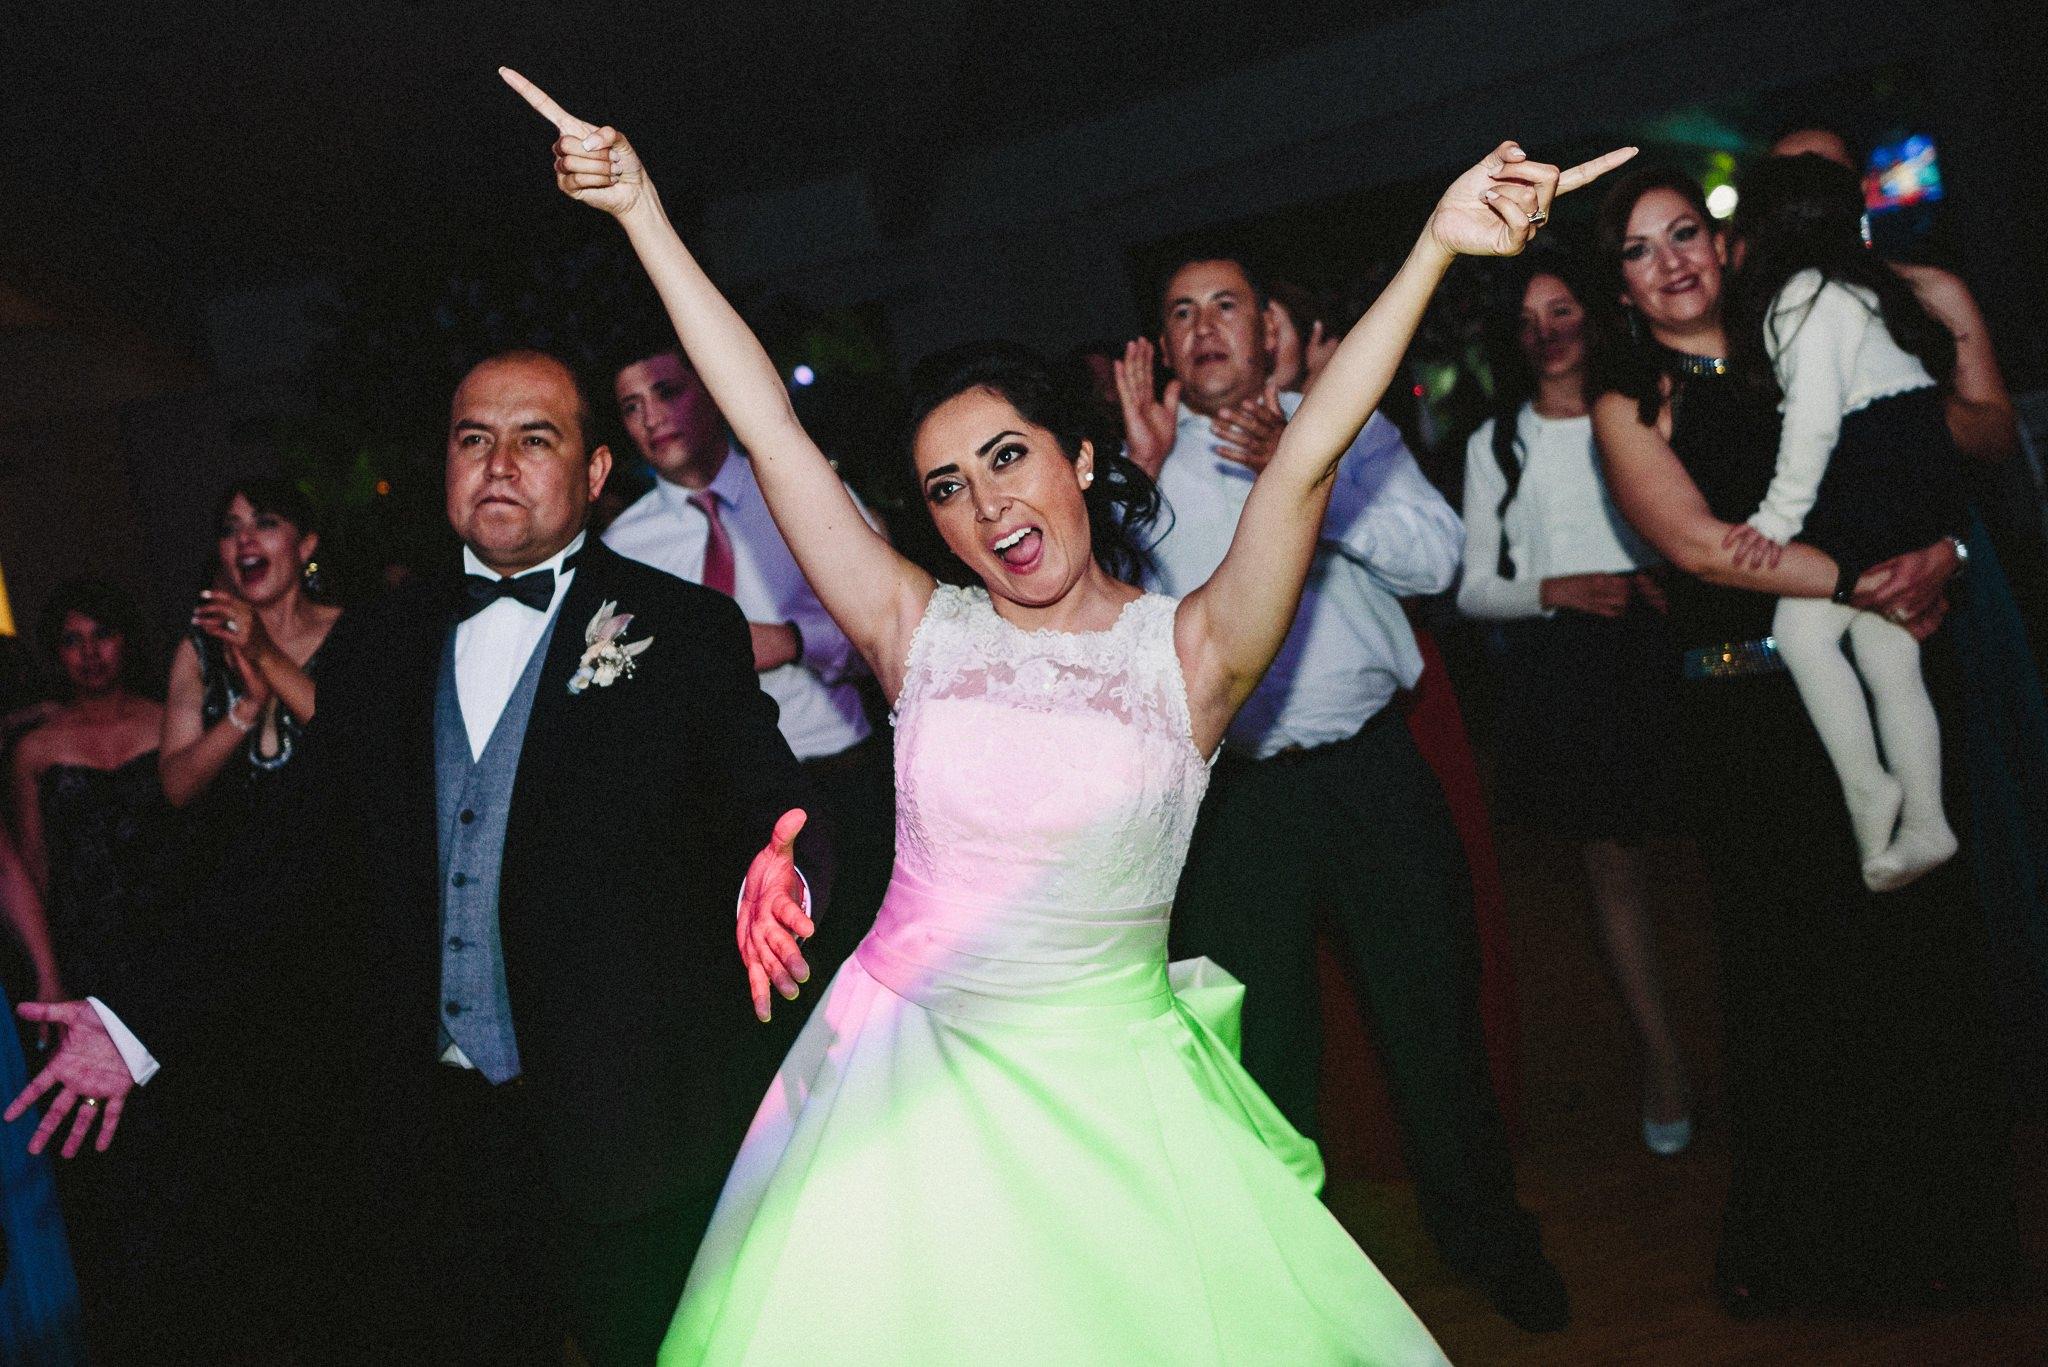 Wedding-Boda-Tulancingo-Hidalgo-Salon-Essenzia-Luis-Houdin-83-film